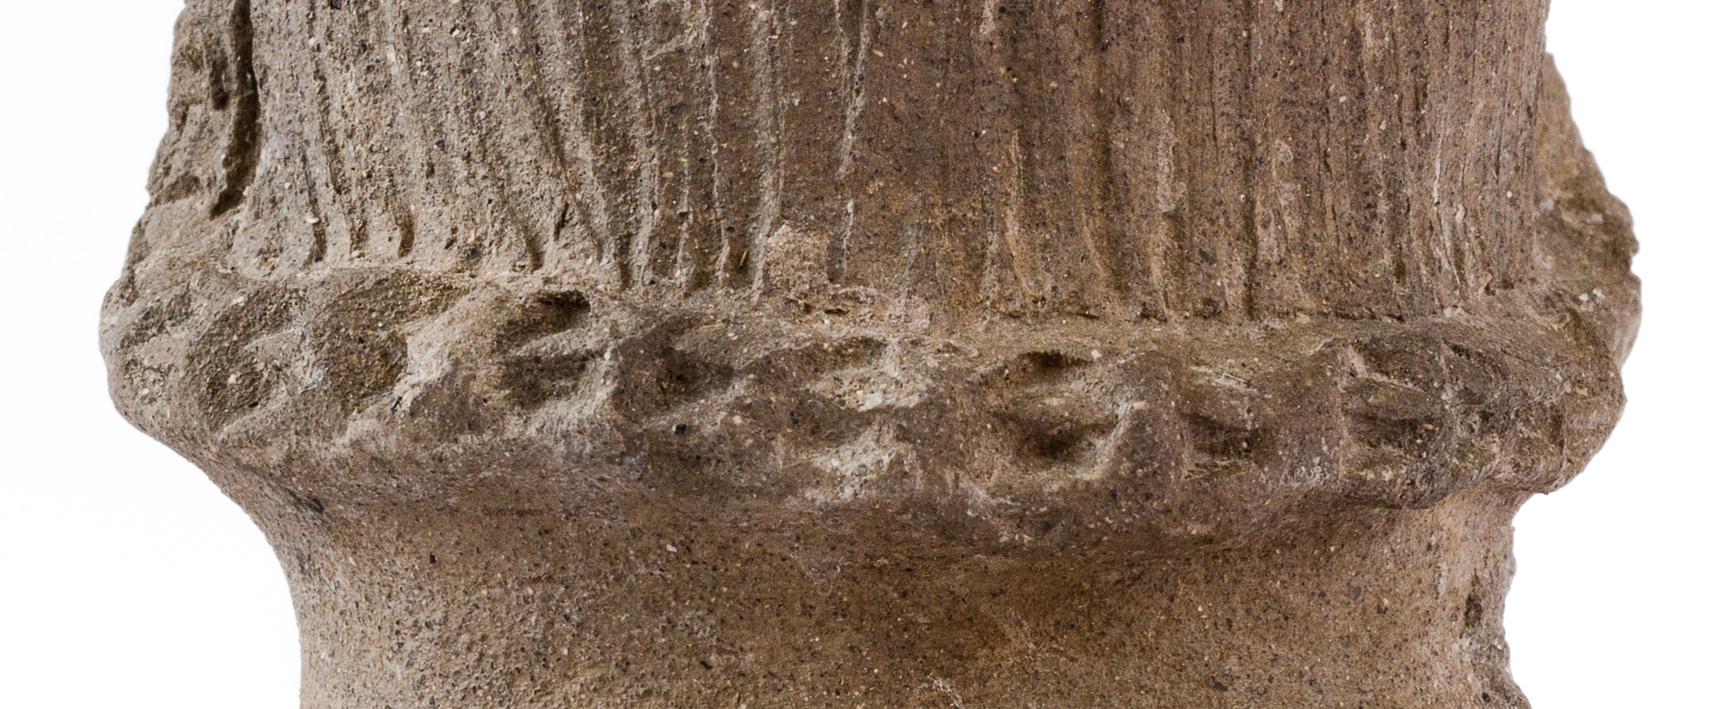 Judenaquamanile Krems-Detail